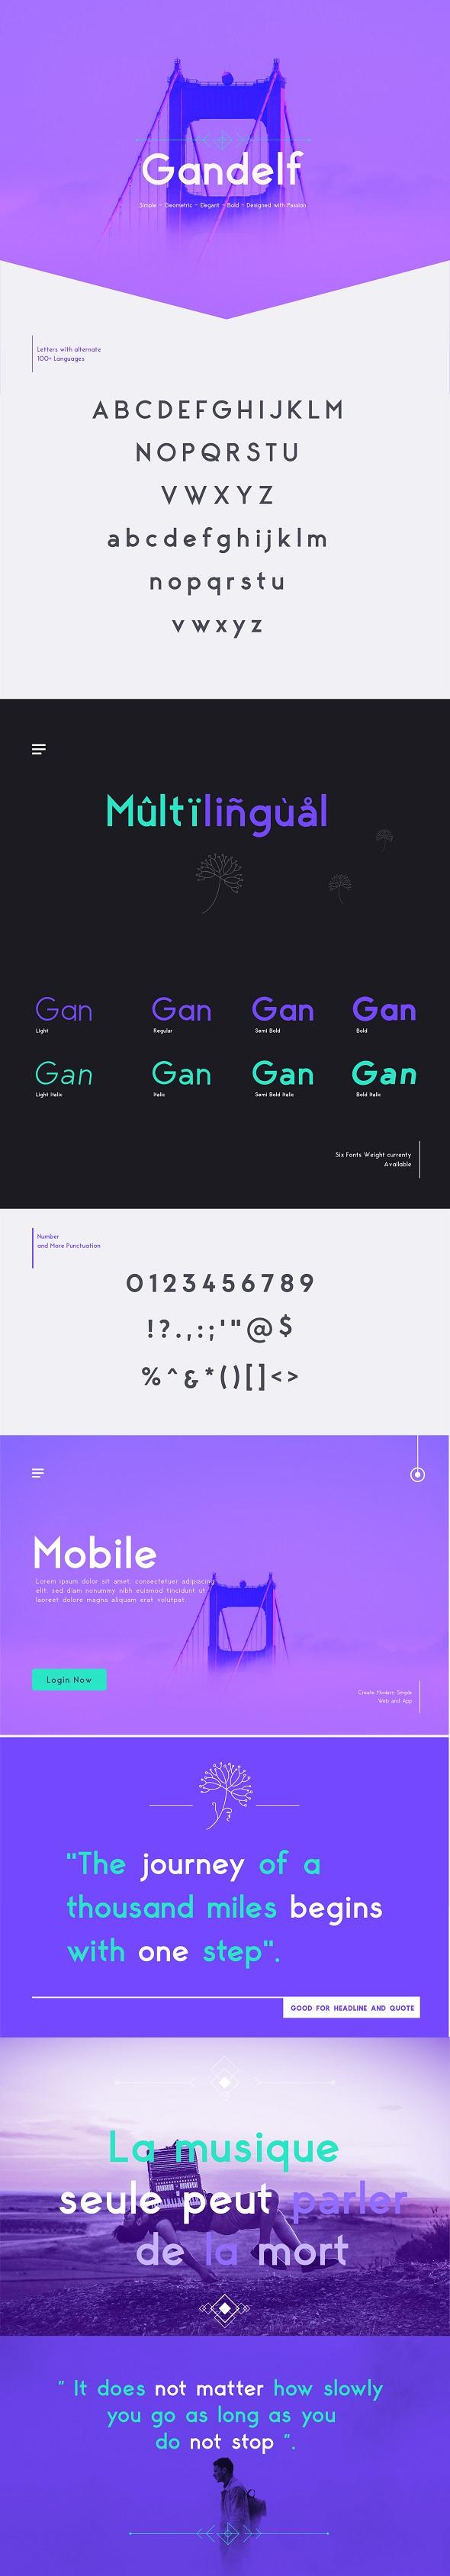 Gandelf - Elegant, Geometric, Clean, Fashionable Sans Serif Font - Sans-Serif Fonts